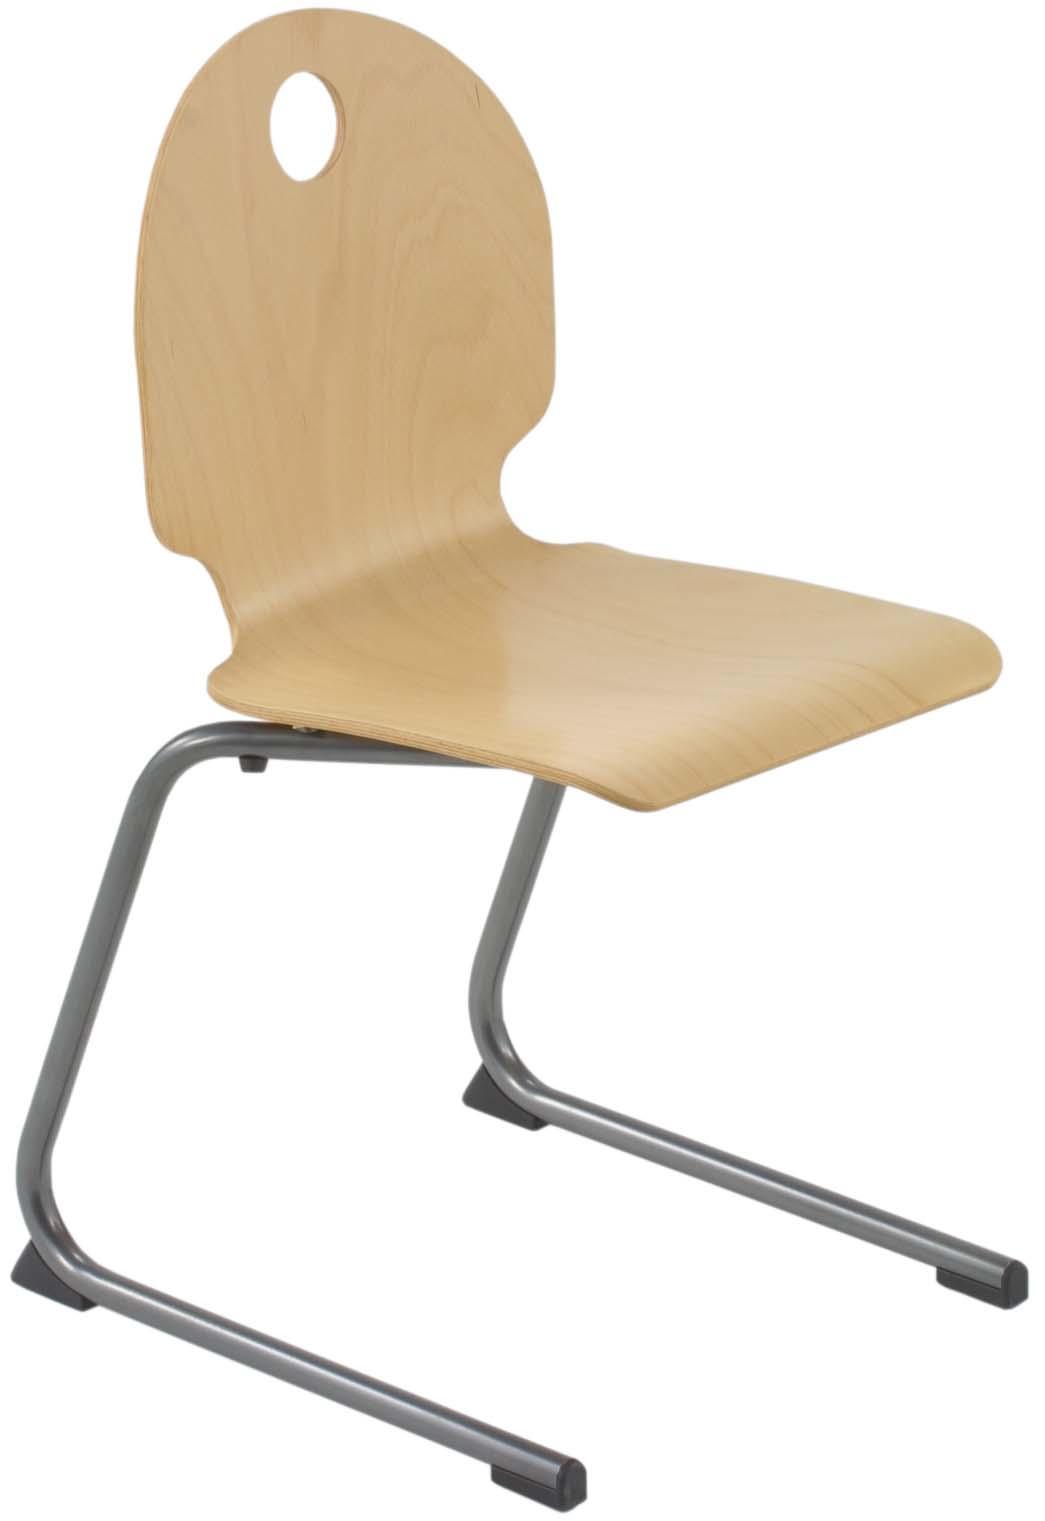 chaise coque bois mobilier goz. Black Bedroom Furniture Sets. Home Design Ideas